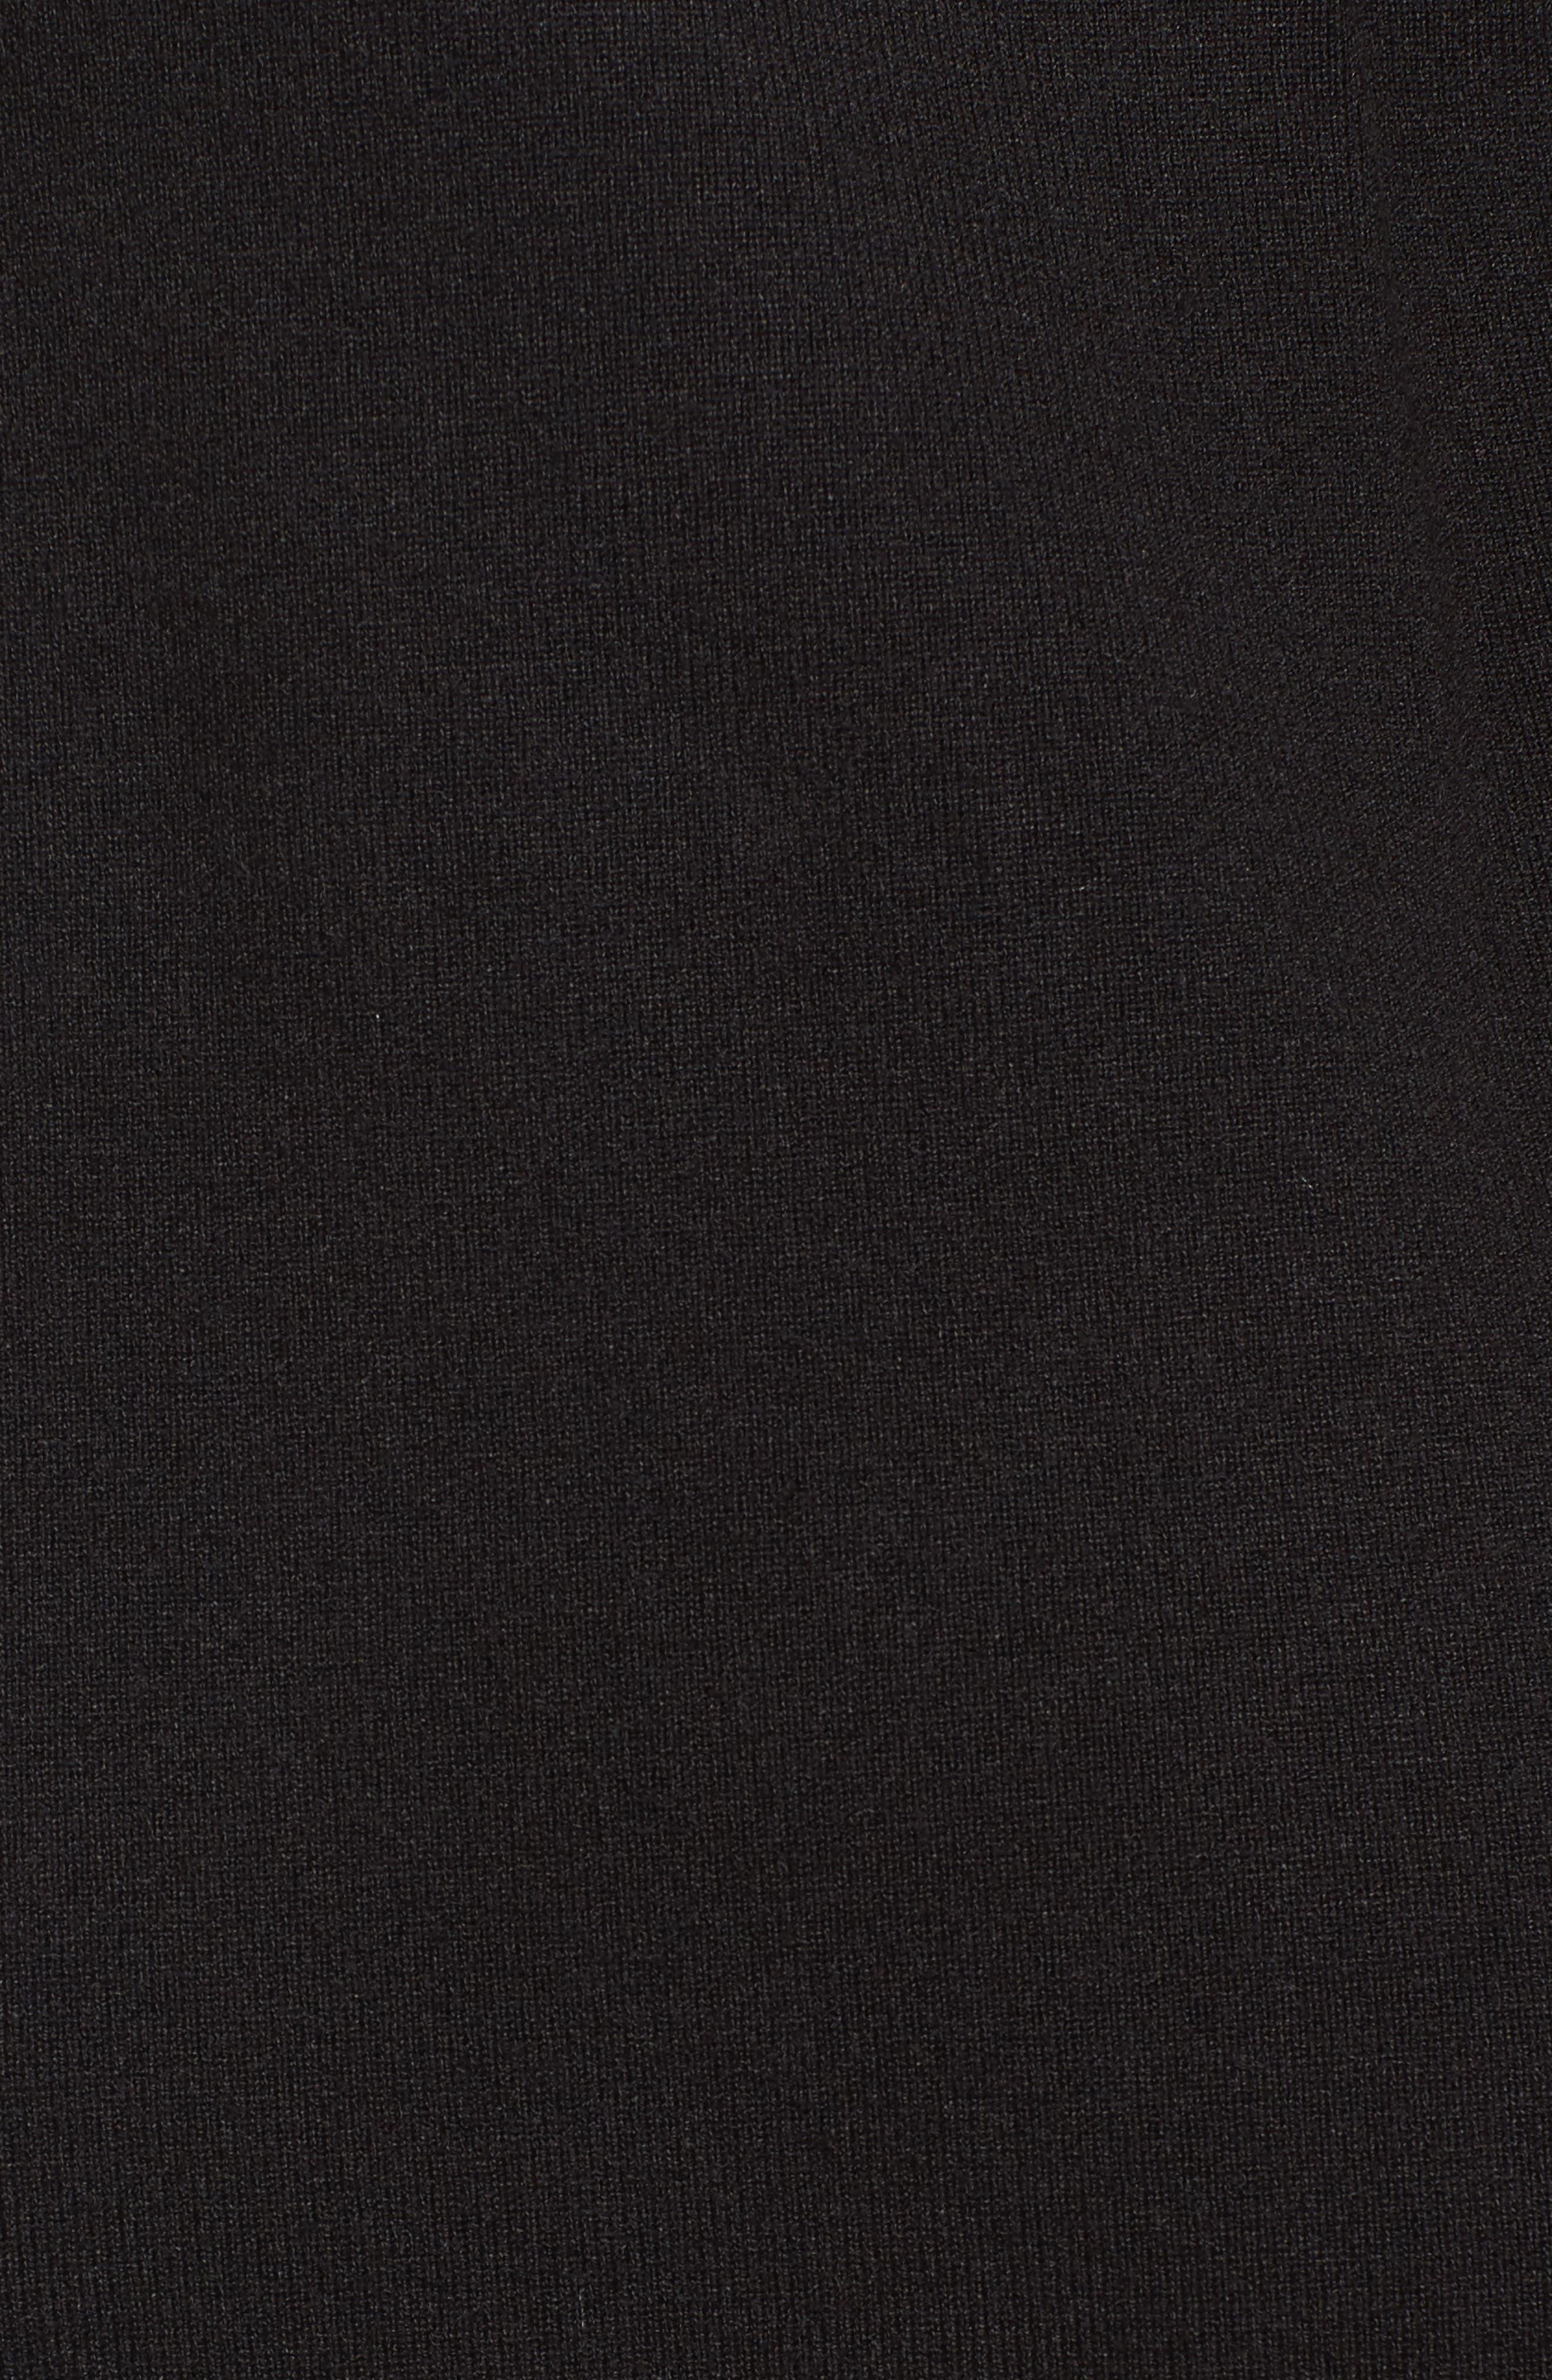 Ann Klein New York Stripe Border Knit Sheath Dress,                             Alternate thumbnail 6, color,                             Black/ White